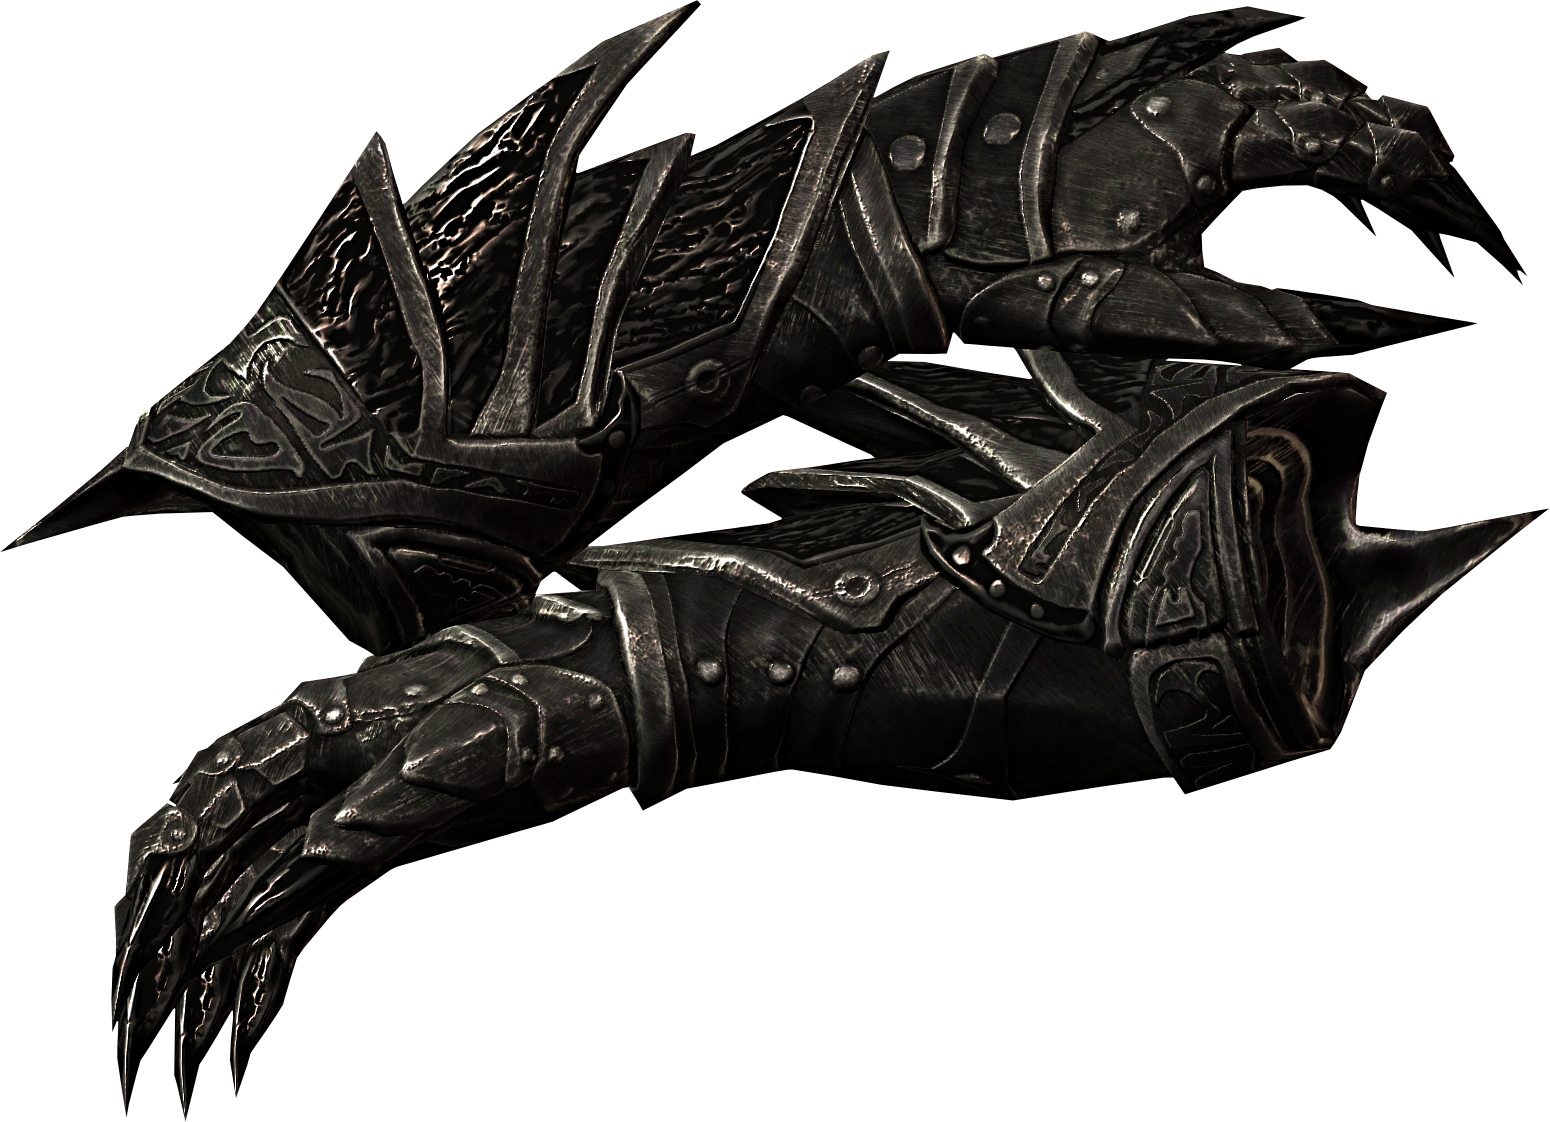 armour artwork claws dark - photo #11